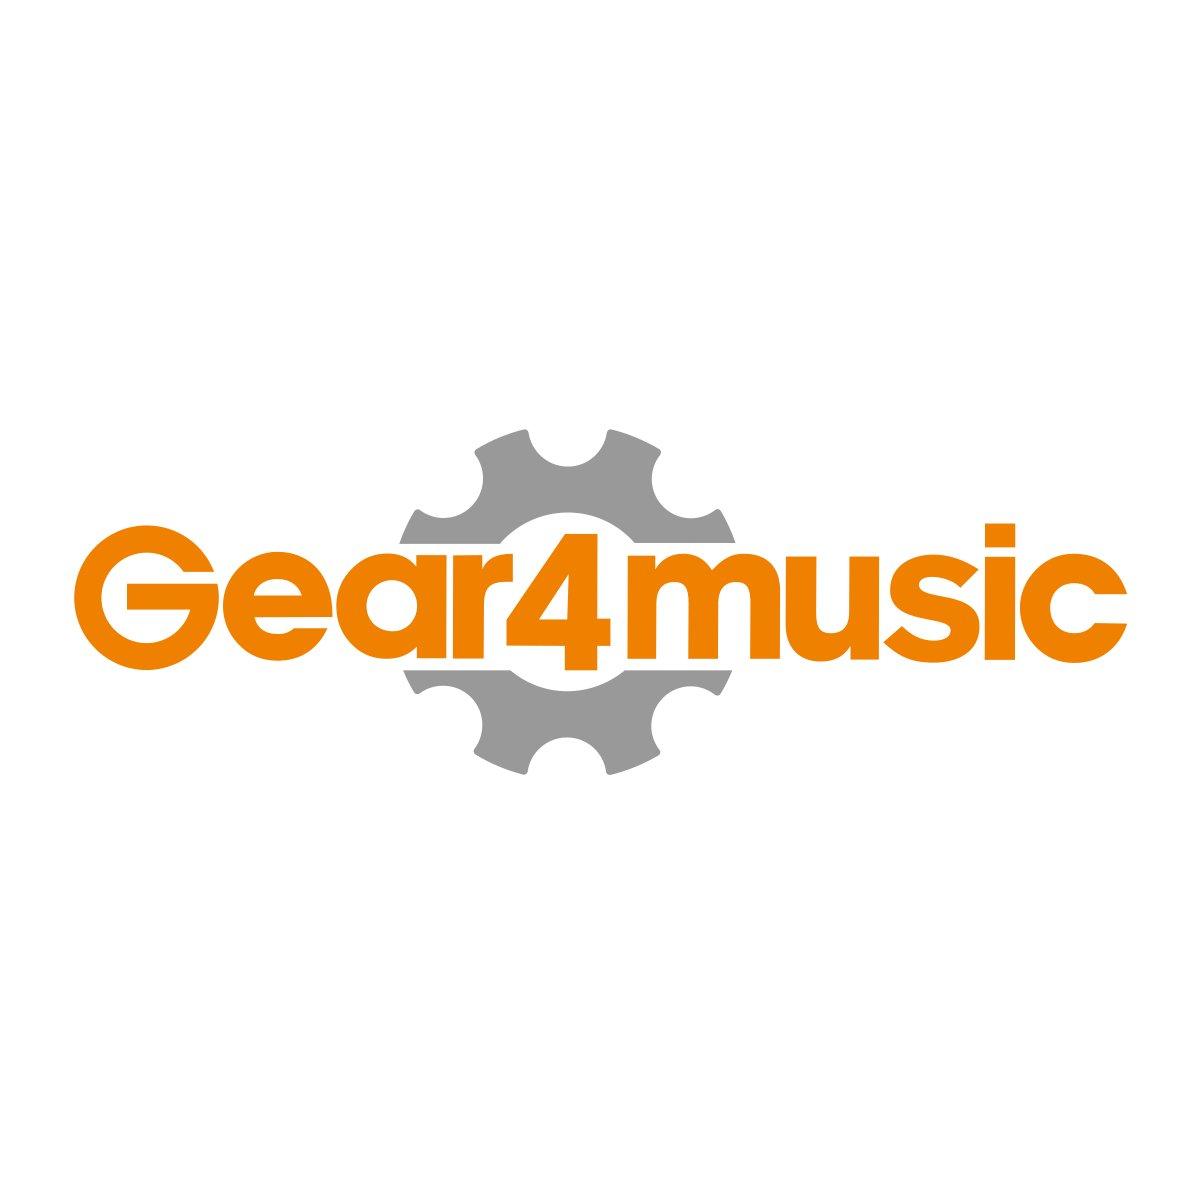 Chicago 5 strunowa gitara basowa Trans Red + 35W Amp pakiet marki Gear4music